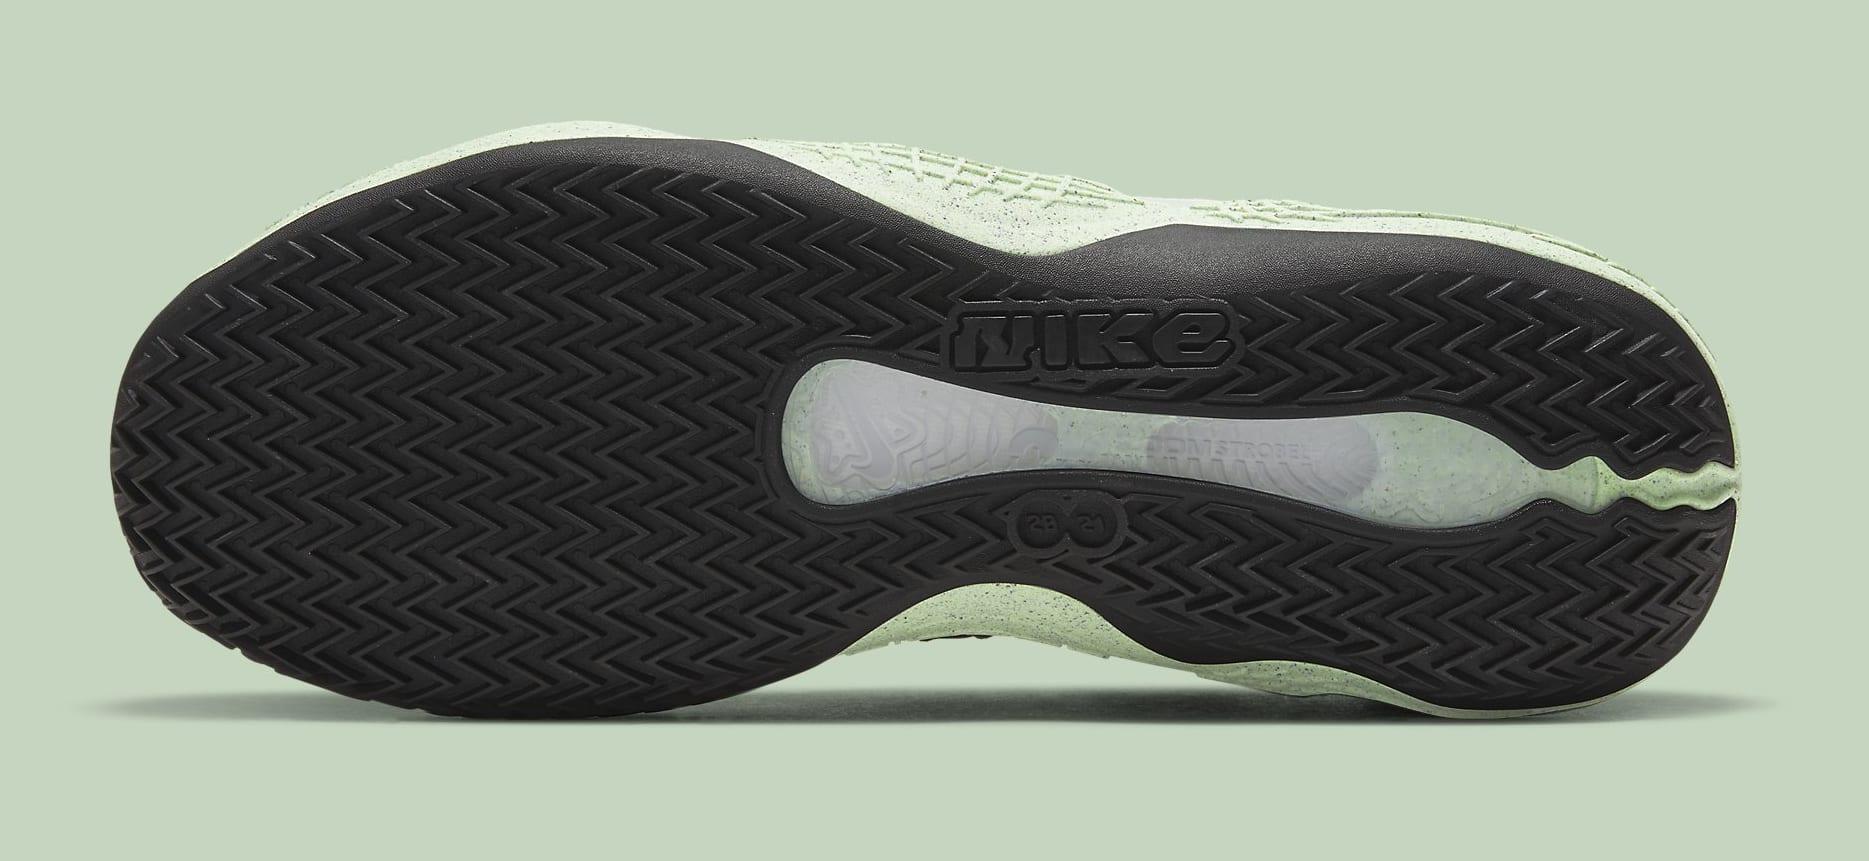 Nike Cosmic Unity 'Green Glow' DA6725-001 Outsole